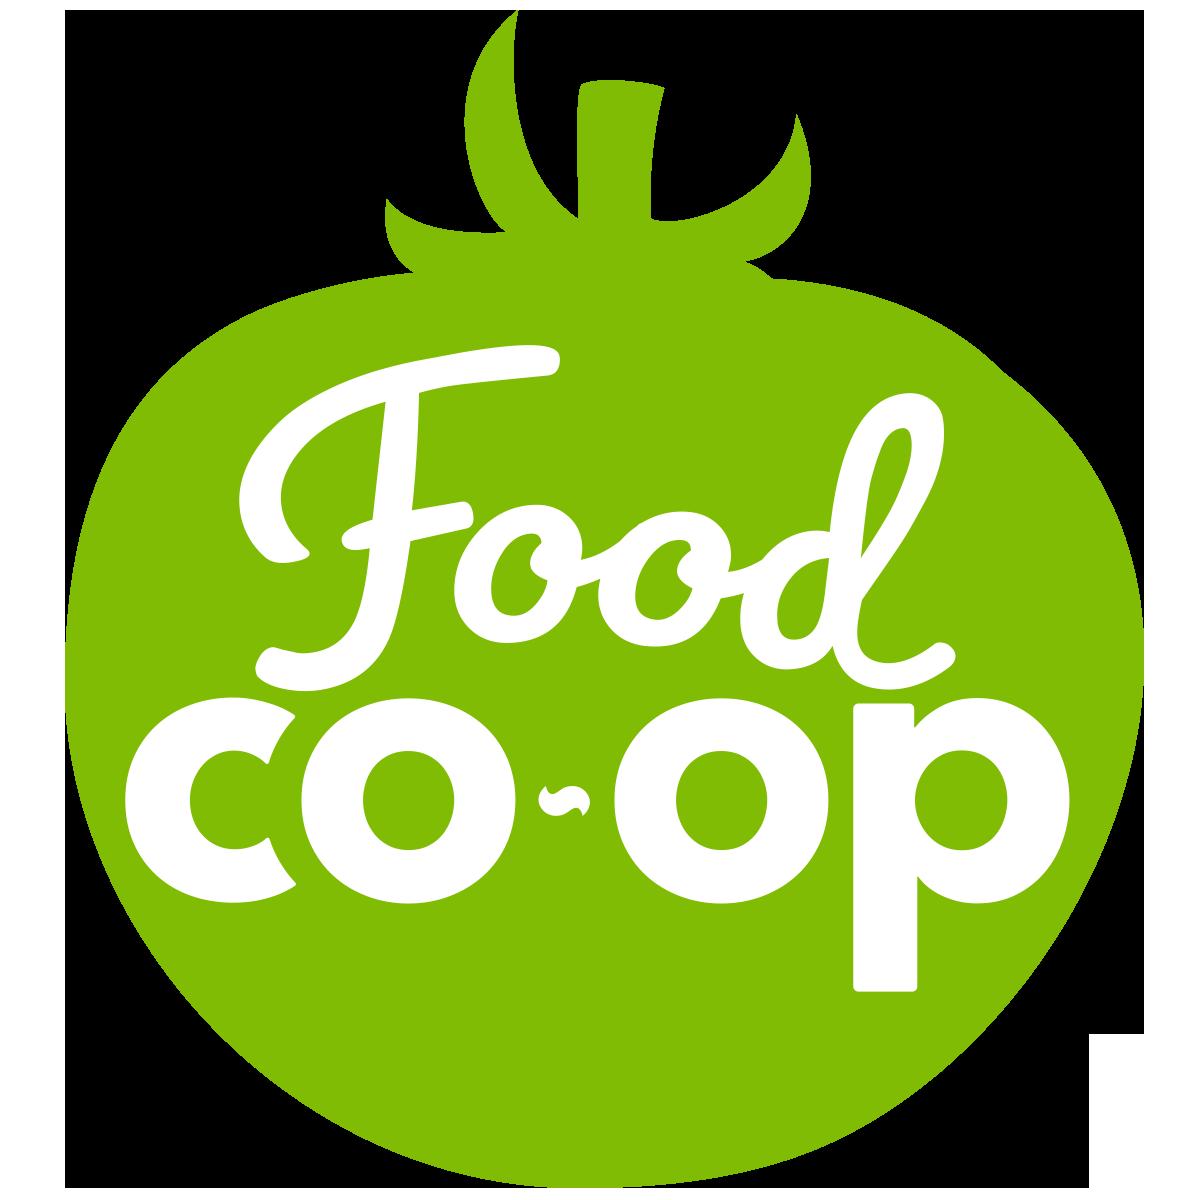 CherryTomato_LtGr_Food_coop.png